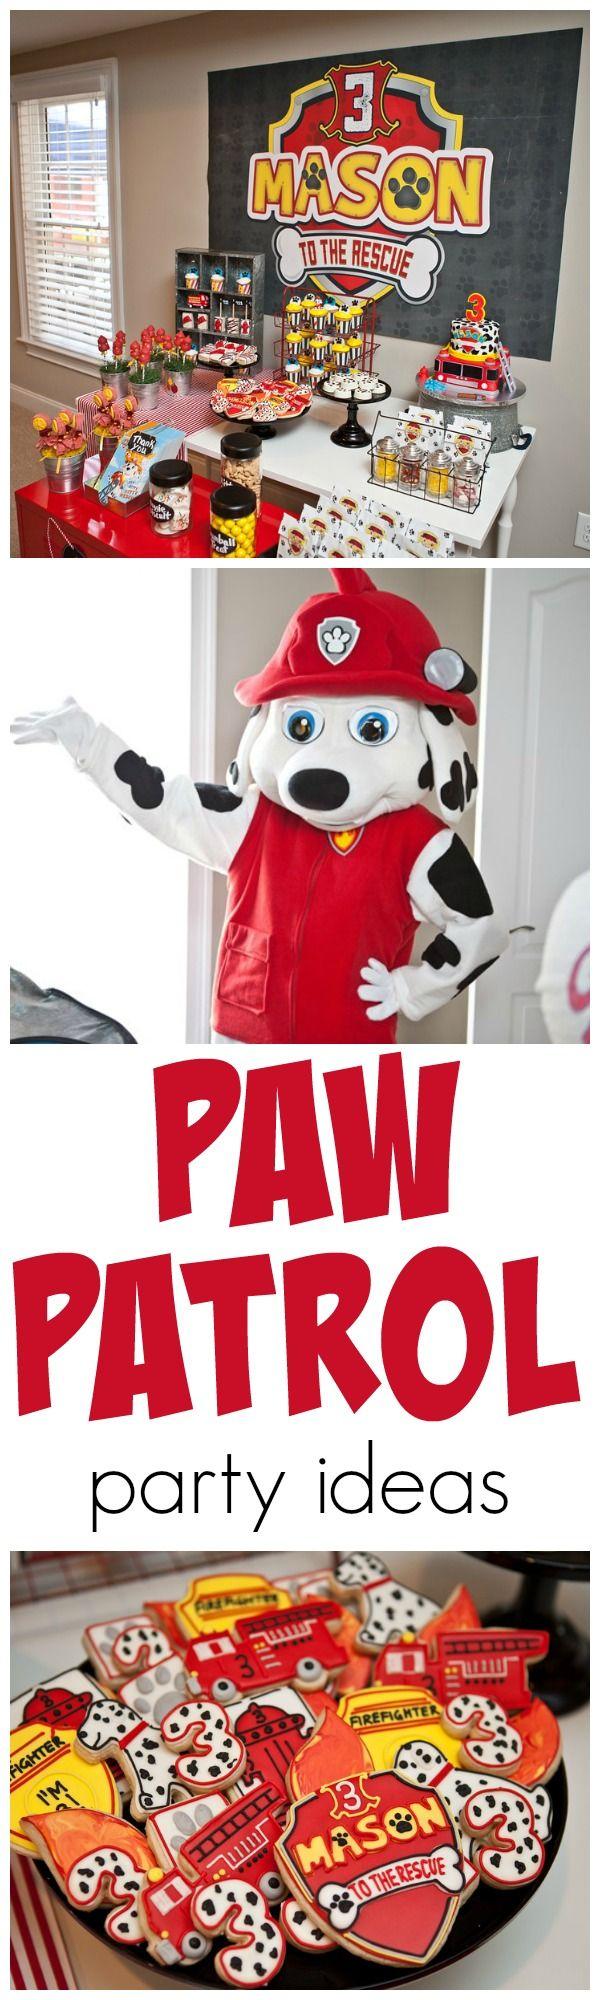 Adorable Paw Patrol Party Ideas!